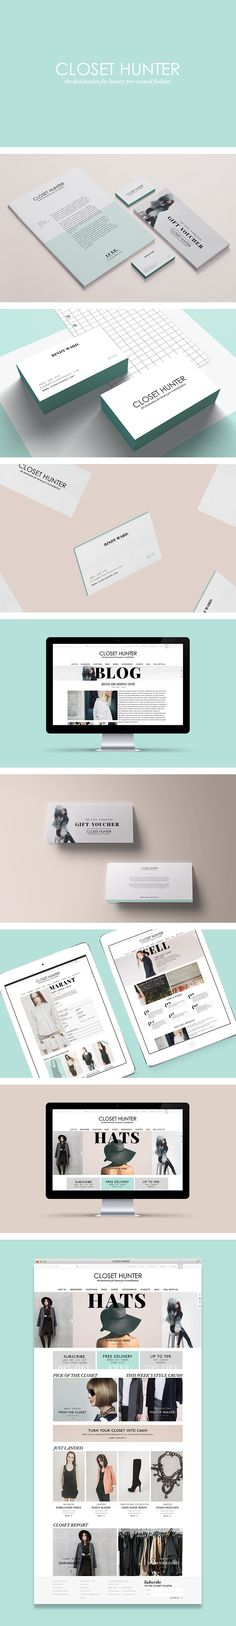 Closet Hunter branding by Smack Bang Designs #Branding #BusinessCards #Stationary #Website #GraphicDesign #SmackBangDesigns